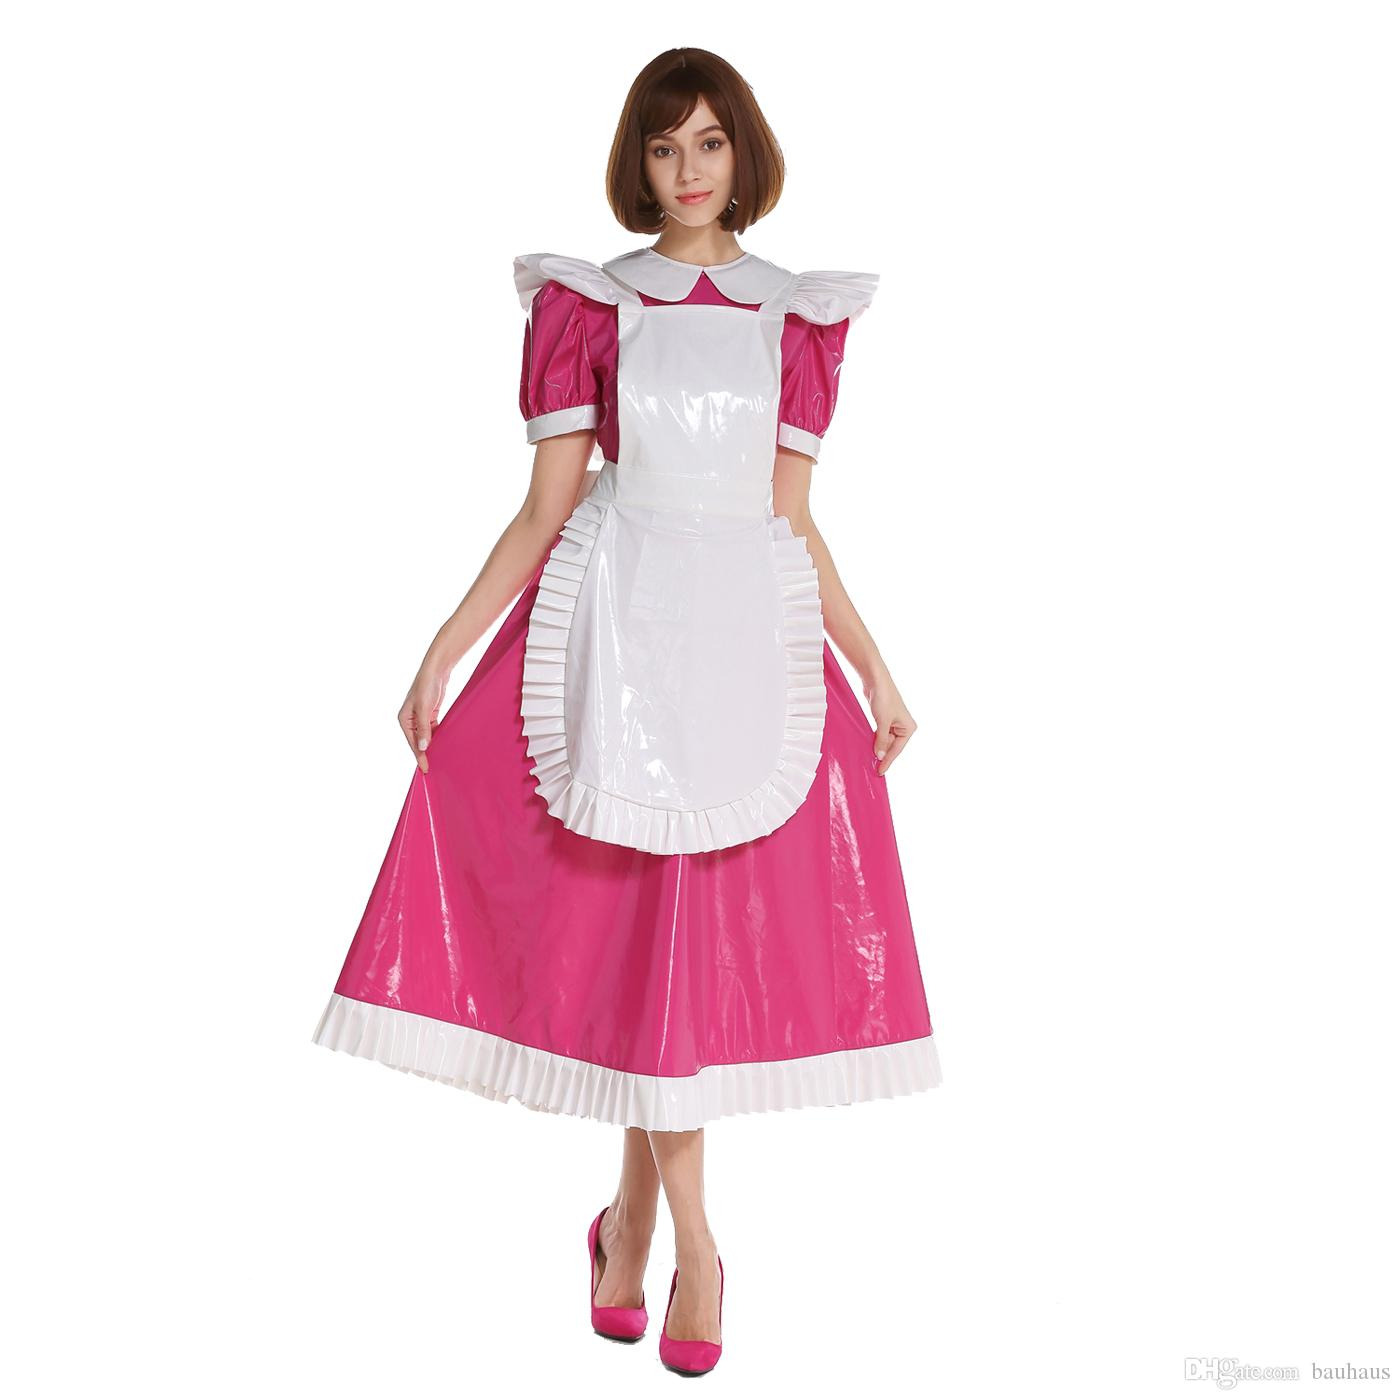 fc7da354e5 New Arrival Sissy Girl Maid Lockable Medium Length PVC Dress Uniform  Crossdresser Uniform Cosplay Costume Crossdressing Canada 2019 From  Bauhaus